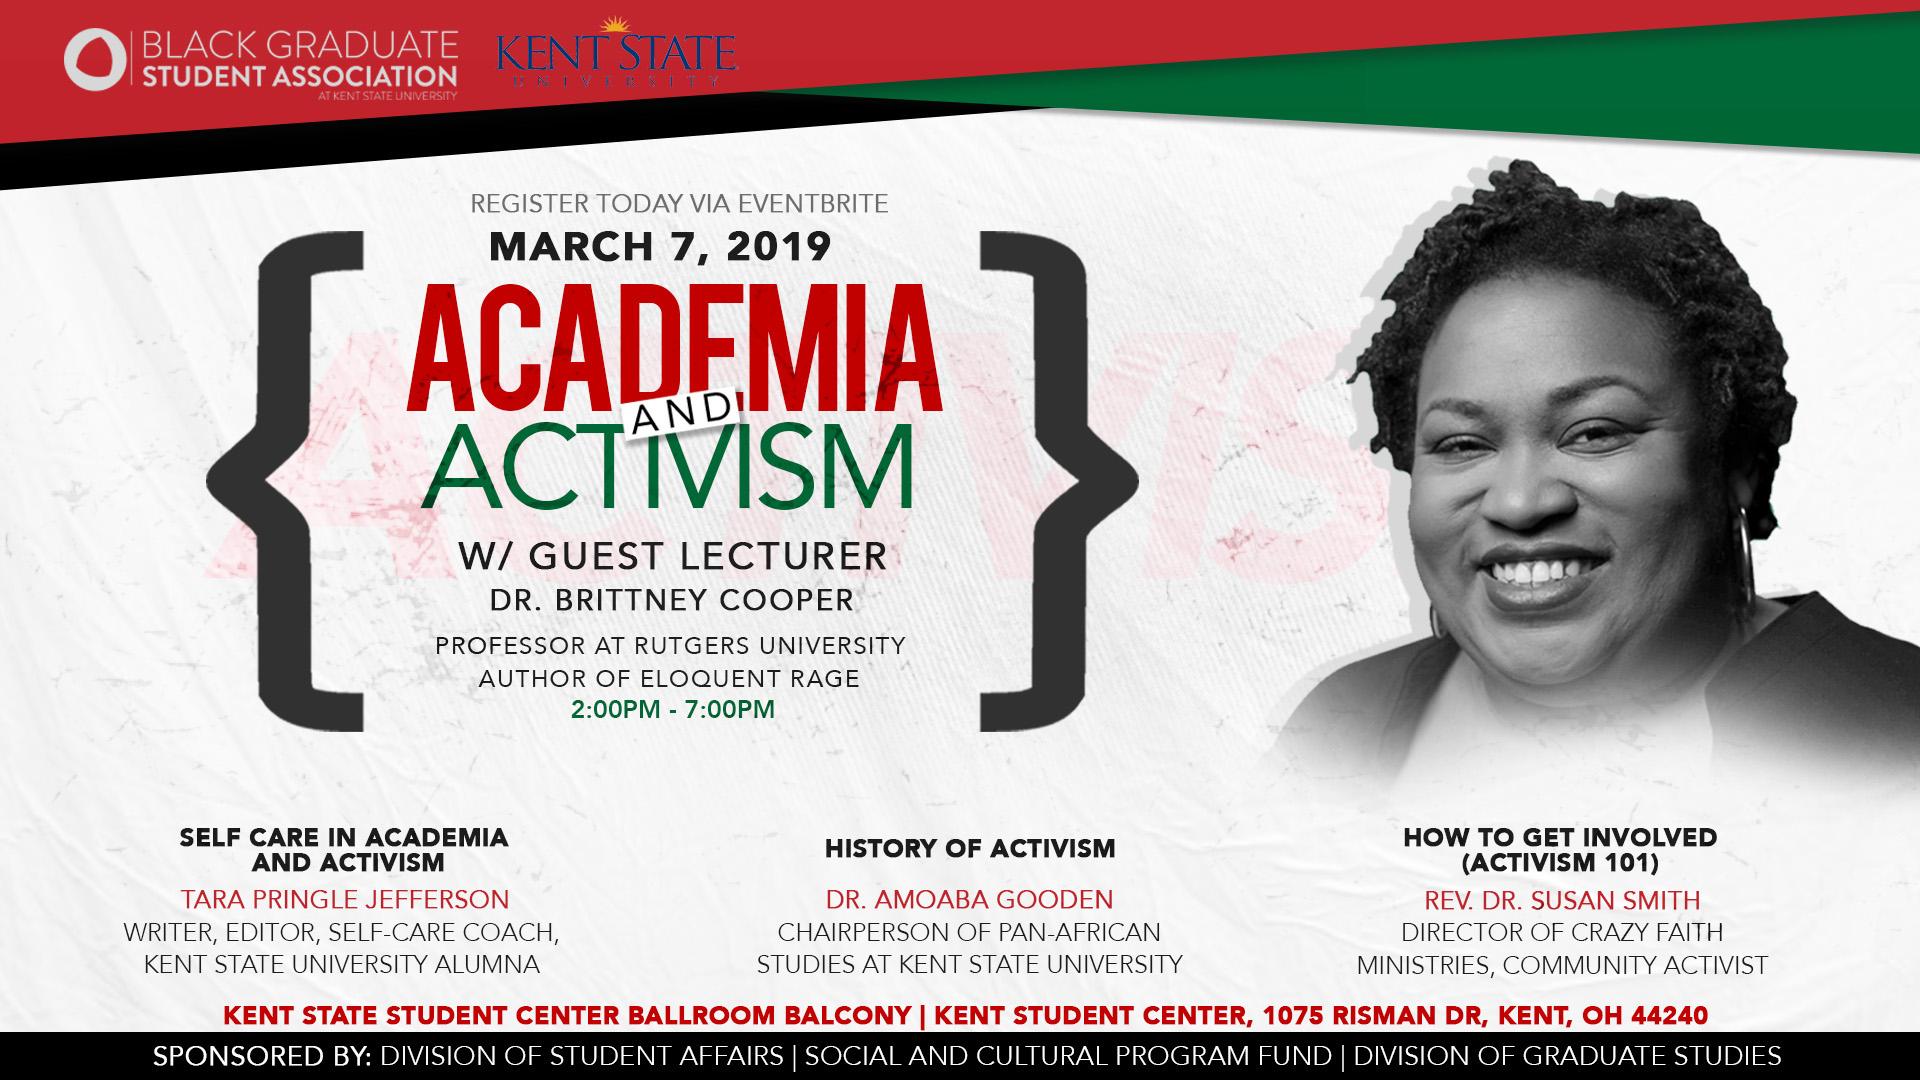 Flyer for BGSA 2019 Conference